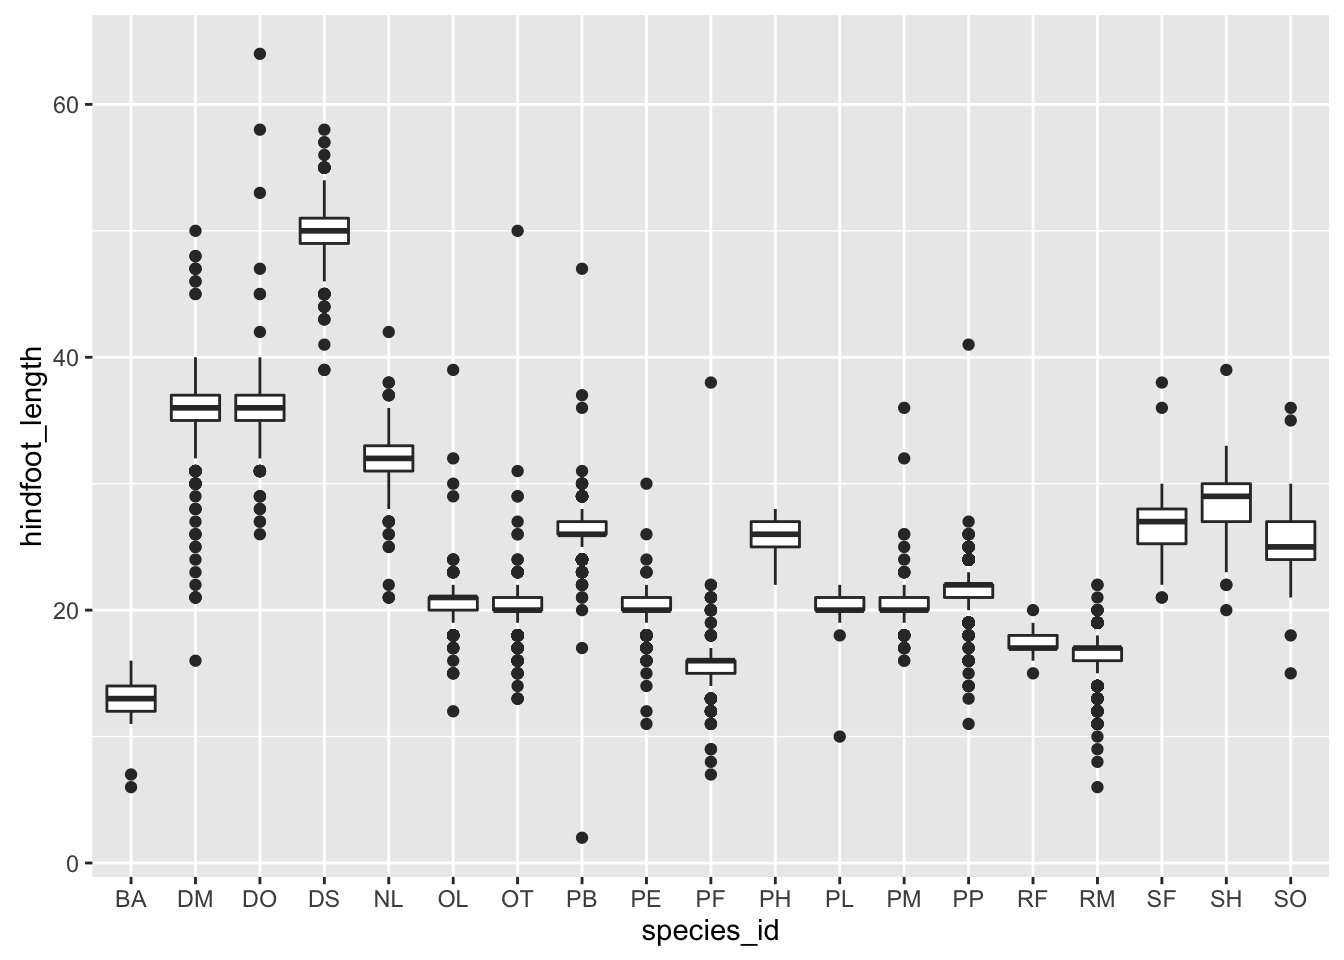 Data visualization with ggplot2